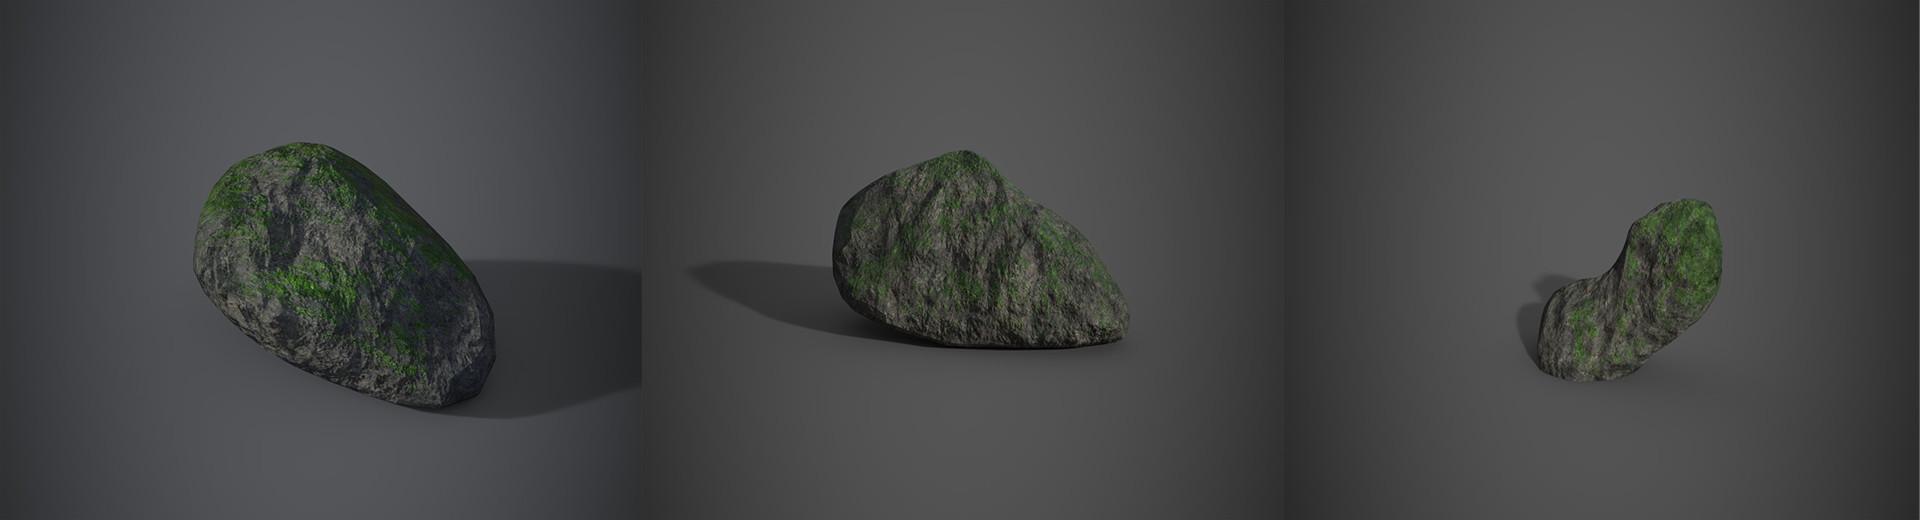 Rock assets